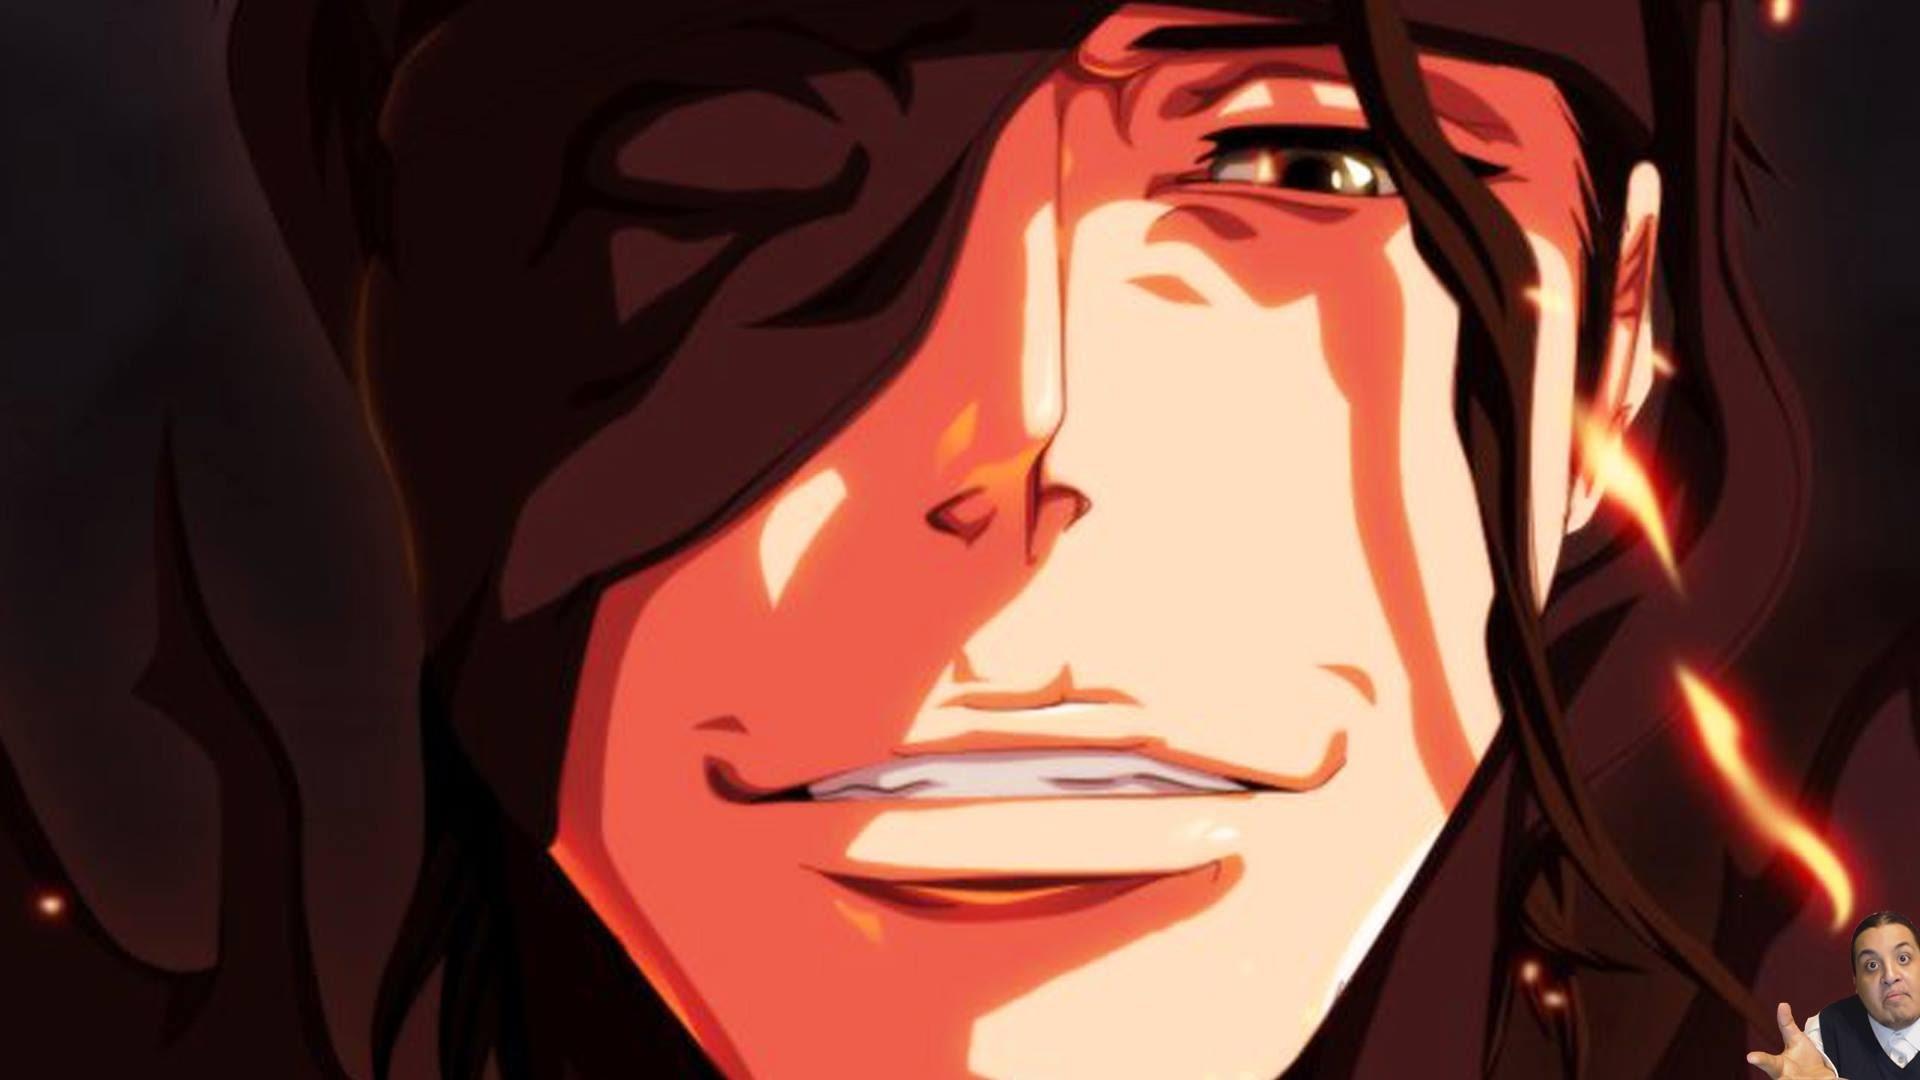 Aizen 622 Manga Chapter ブリーチ Review — Bleach Epicness From a FKN Chair